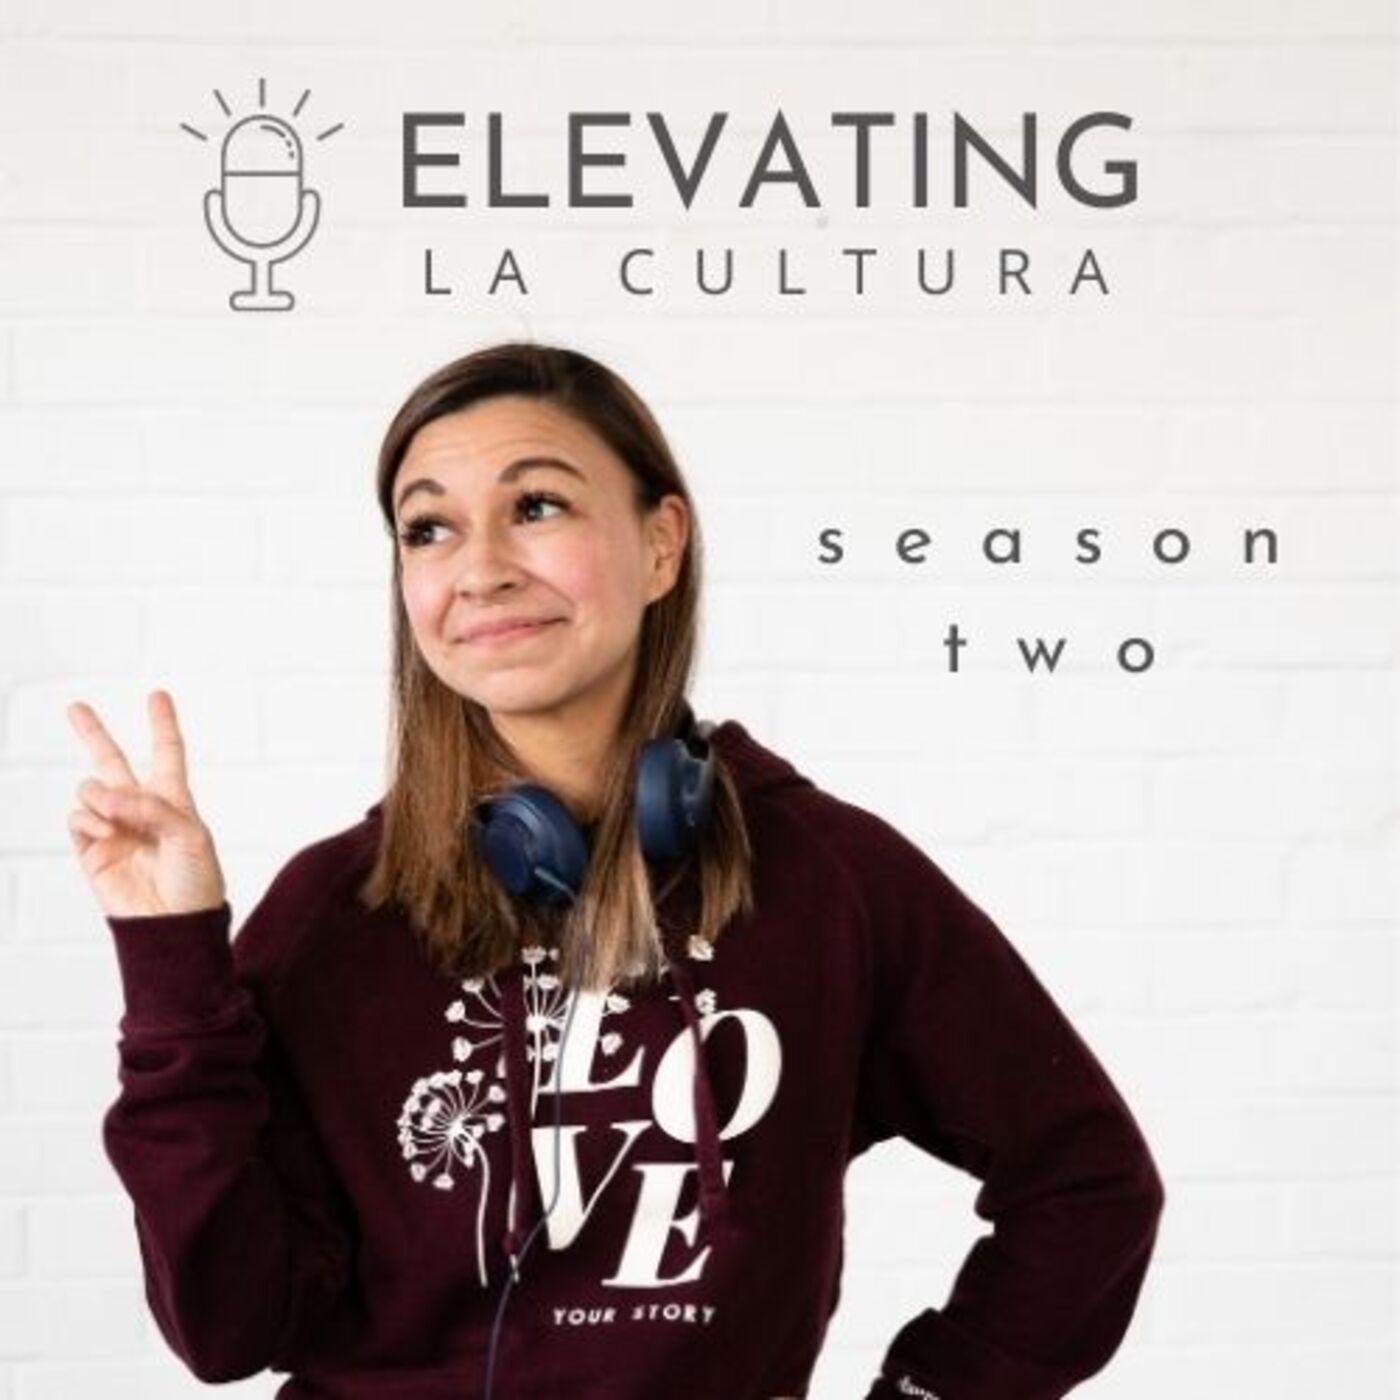 Karina Mora: Season 2 Health & Wellness Intro